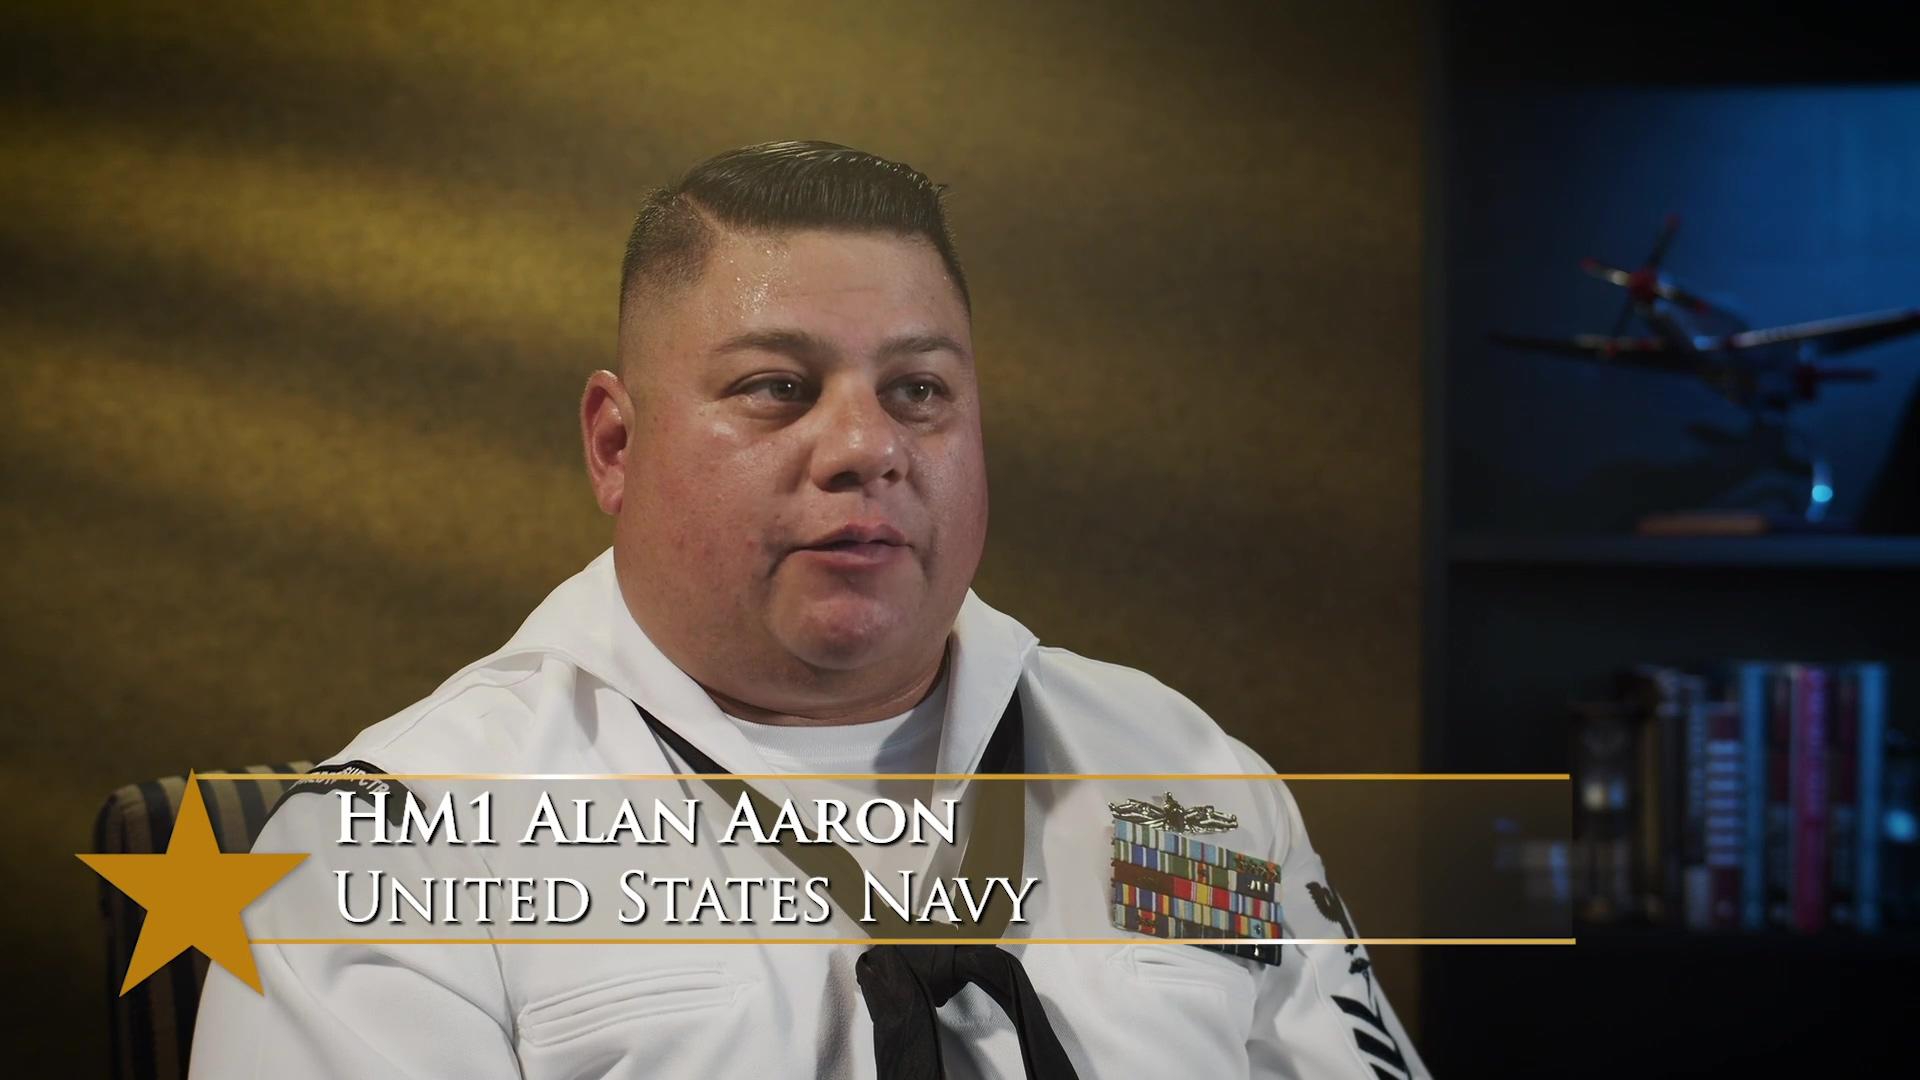 Alan Aaron, USN - Angels of the Battlefield